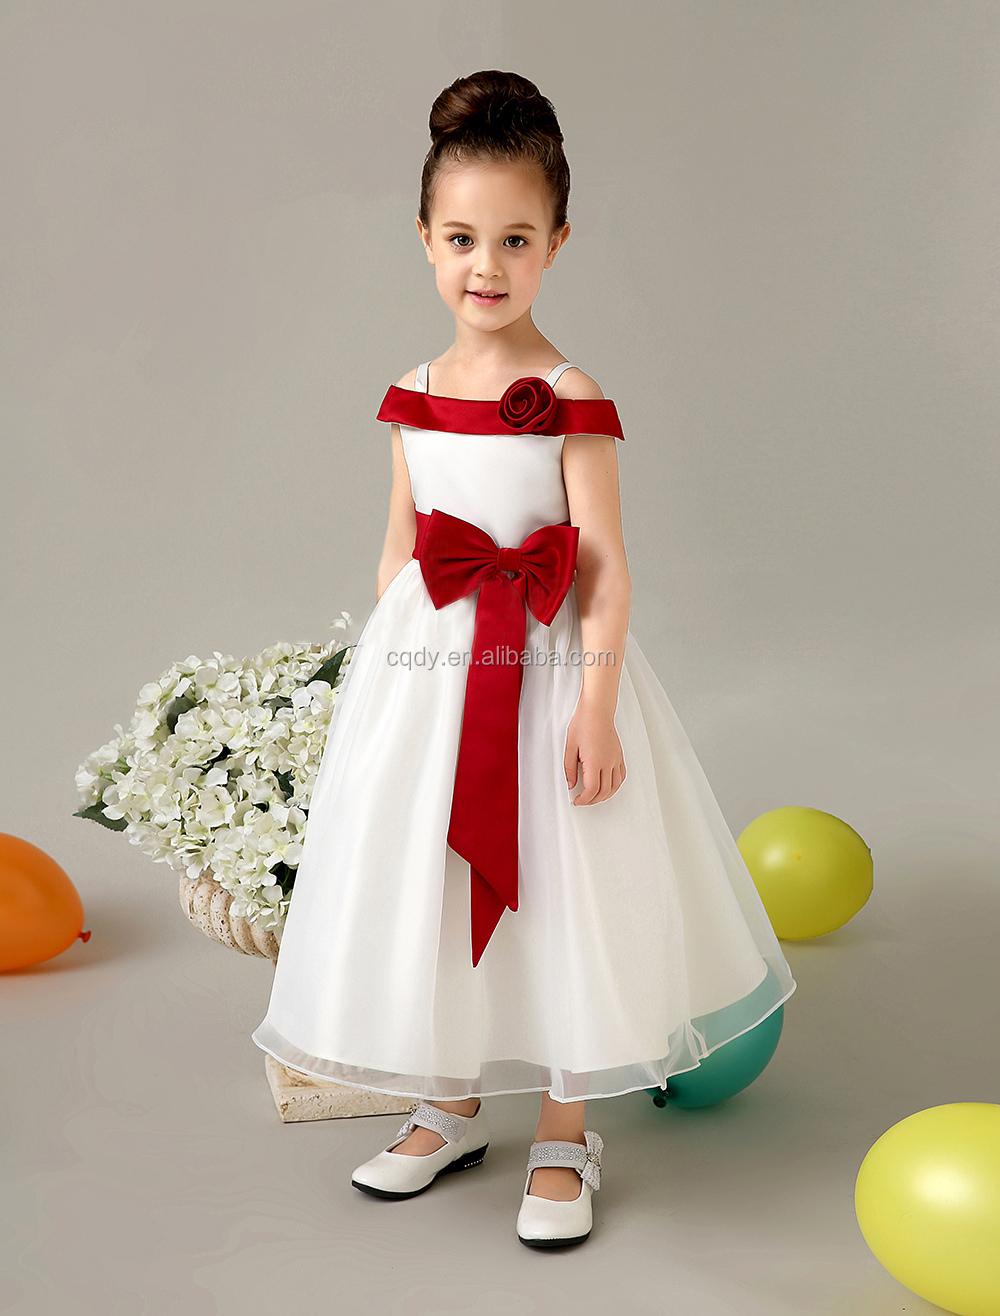 c9c8aafc6829 New Arrival 2015 modern A line round neck long flower girl dresses fancy  dresses for baby